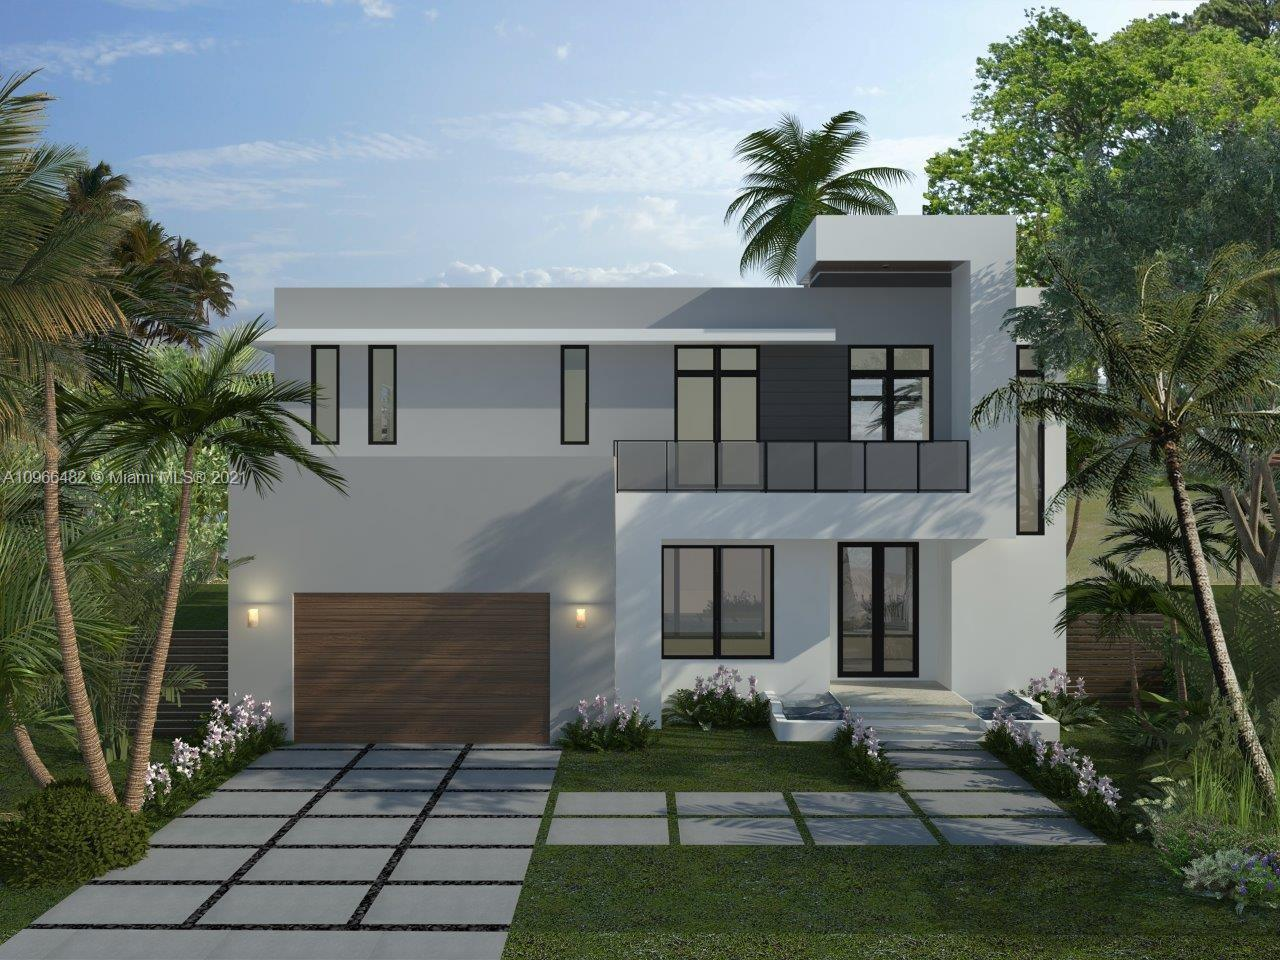 Keystone Point - 13185 Ortega Lane, North Miami, FL 33181-2159